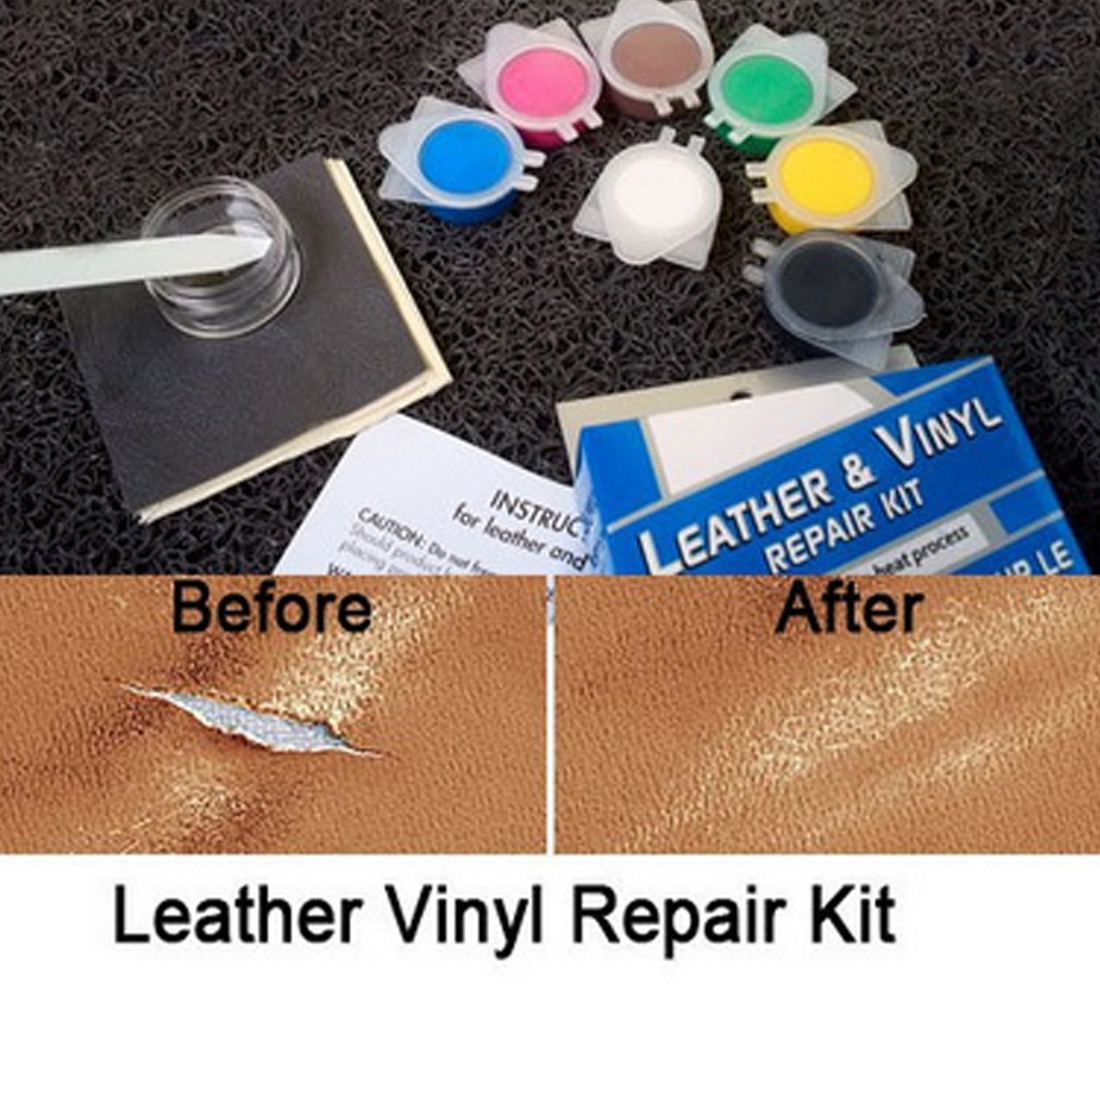 Leather Repair Tool Auto Car Seat Sofa Coats Holes Scratch Cracks Rips No Heat Liquid Leather Vinyl Repair Kit